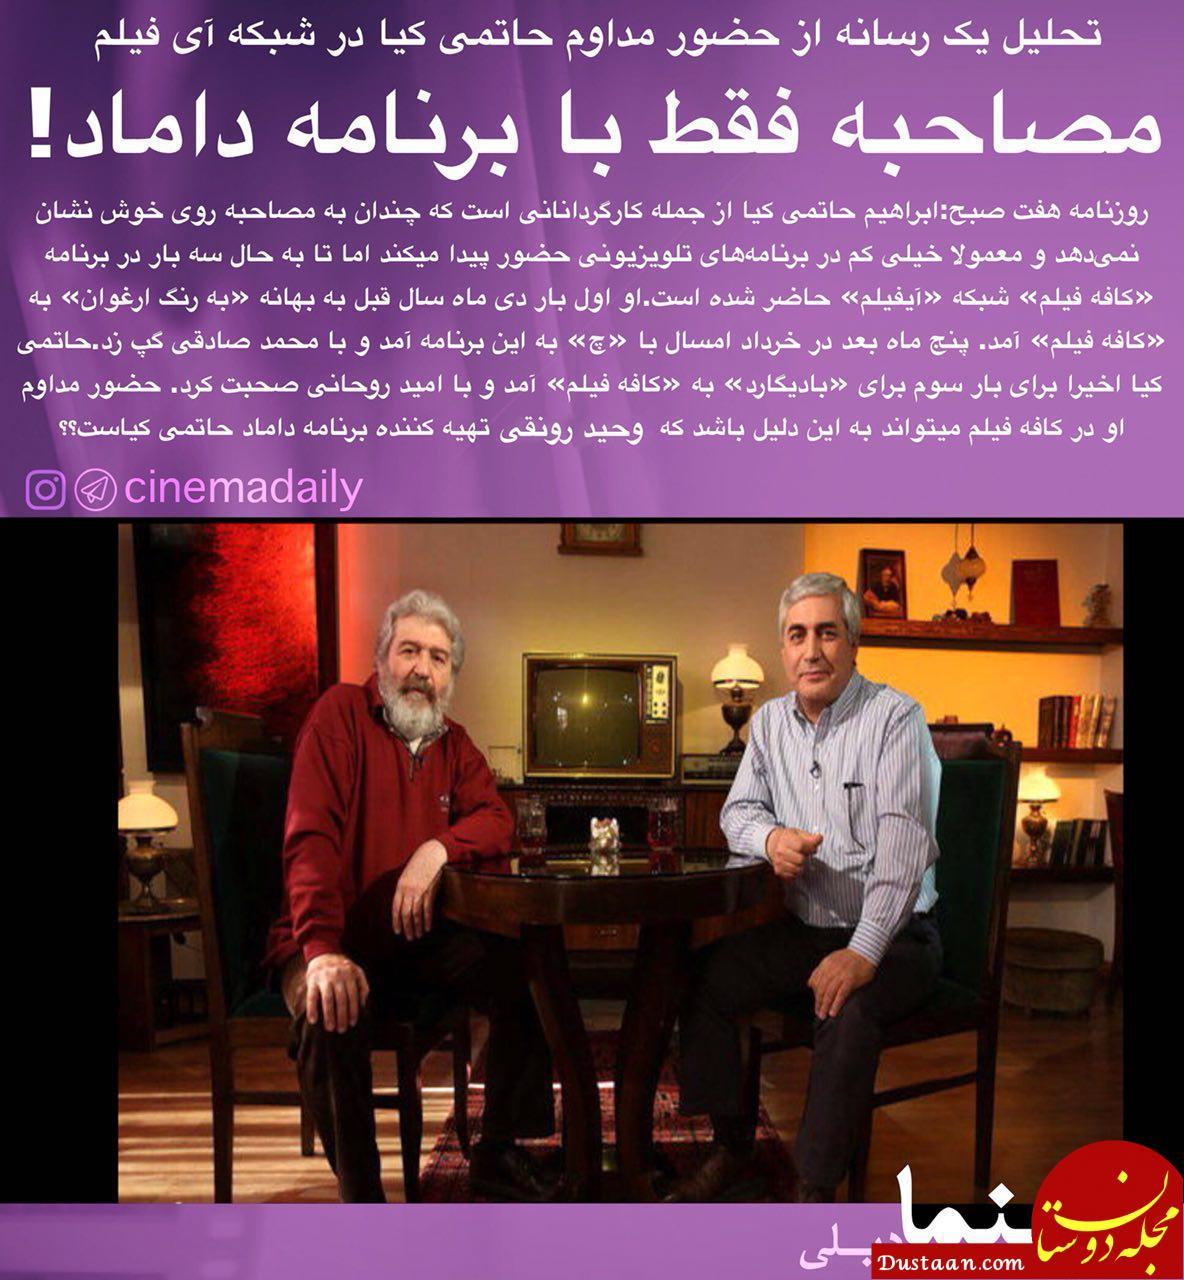 www.dustaan.com مصاحبه فقط با برنامه داماد! +عکس